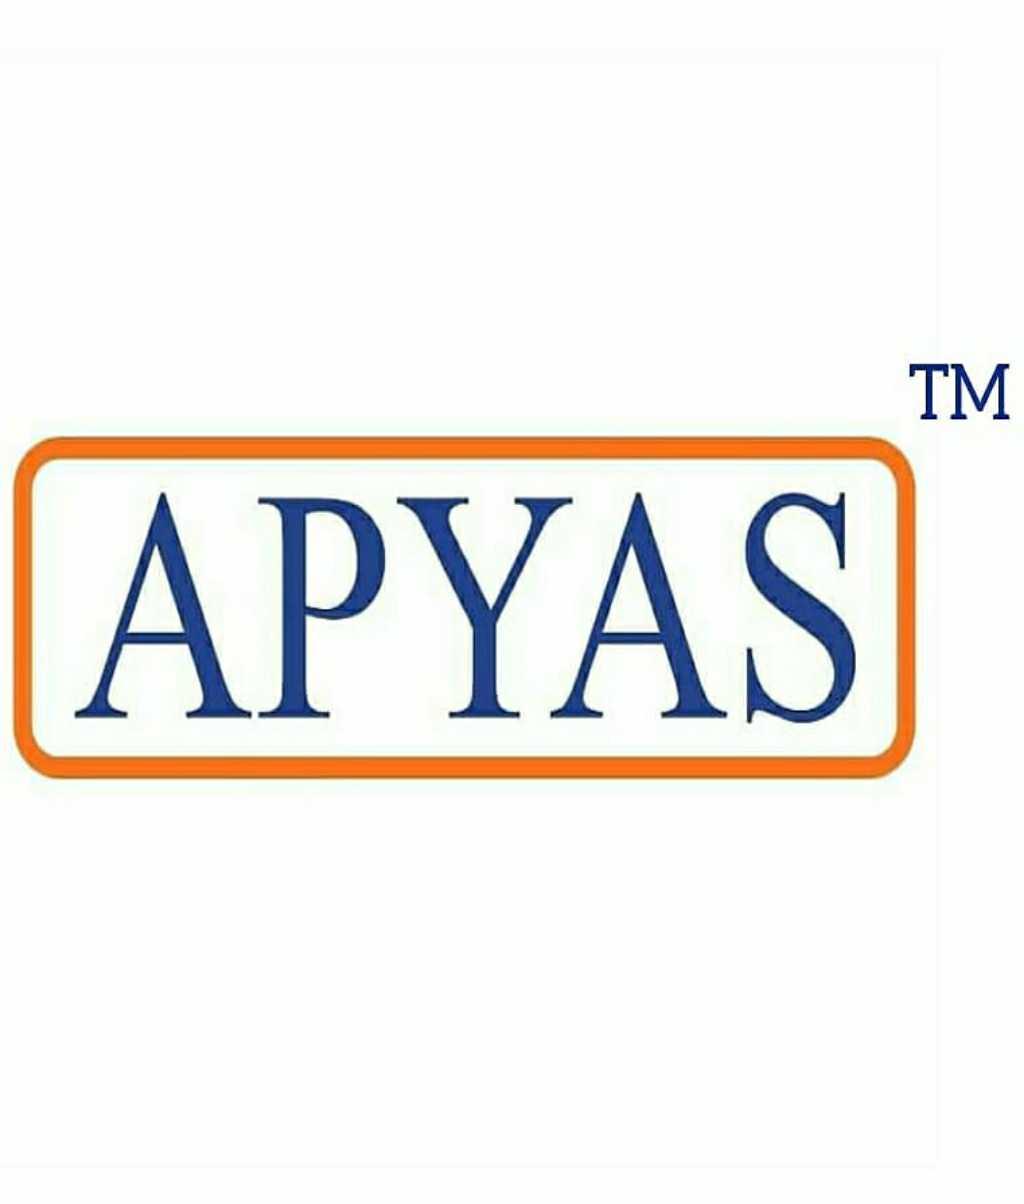 APYAS MOTO GARAGE EQUIPMENT